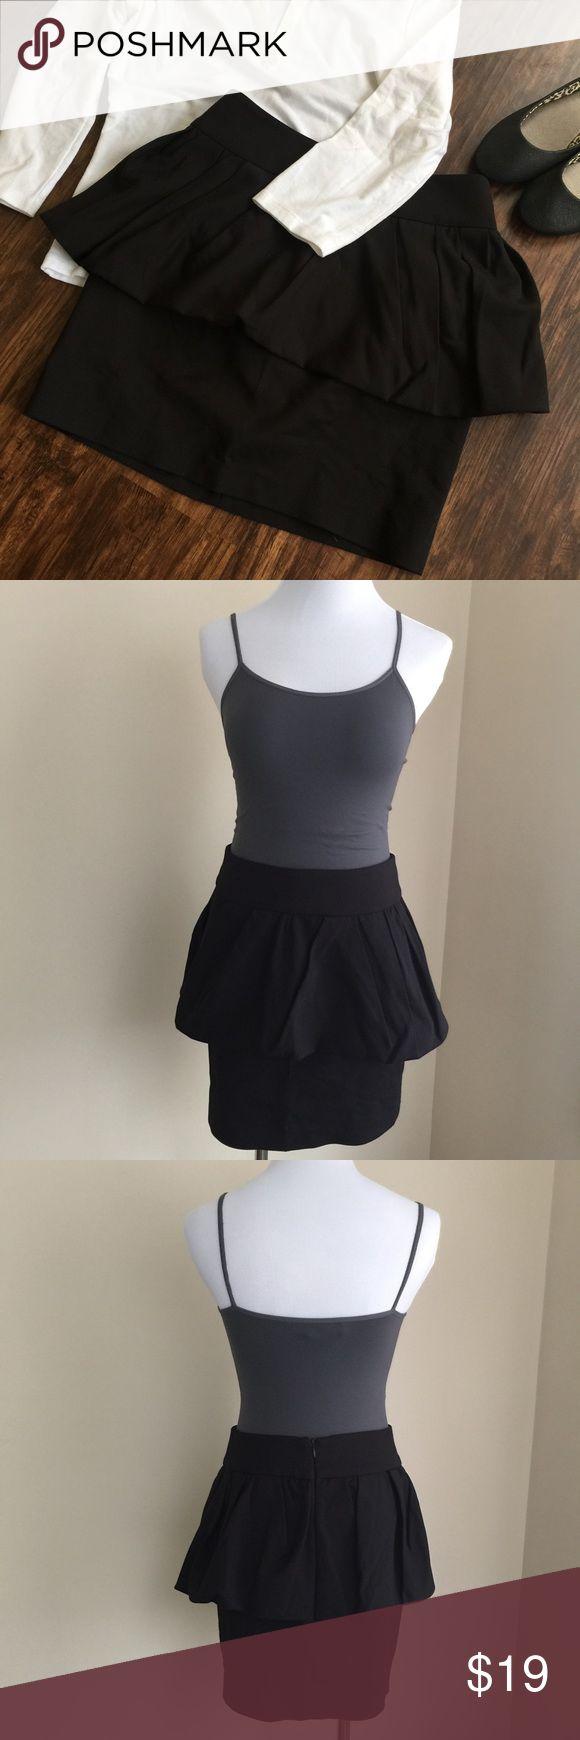 "Zara Woman black peplum miniskirt sz S Zara Woman black peplum skirt, size S.  Mini length, hidden back zip, wide waistband.  Condition:  excellent pre-loved.  Material:  51% cotton/46% polyester/3% elastane.  Measurements (approximate, taken laying flat):  length 16"", flat waist 14"", flat hip 16.5"". Zara Skirts Mini"